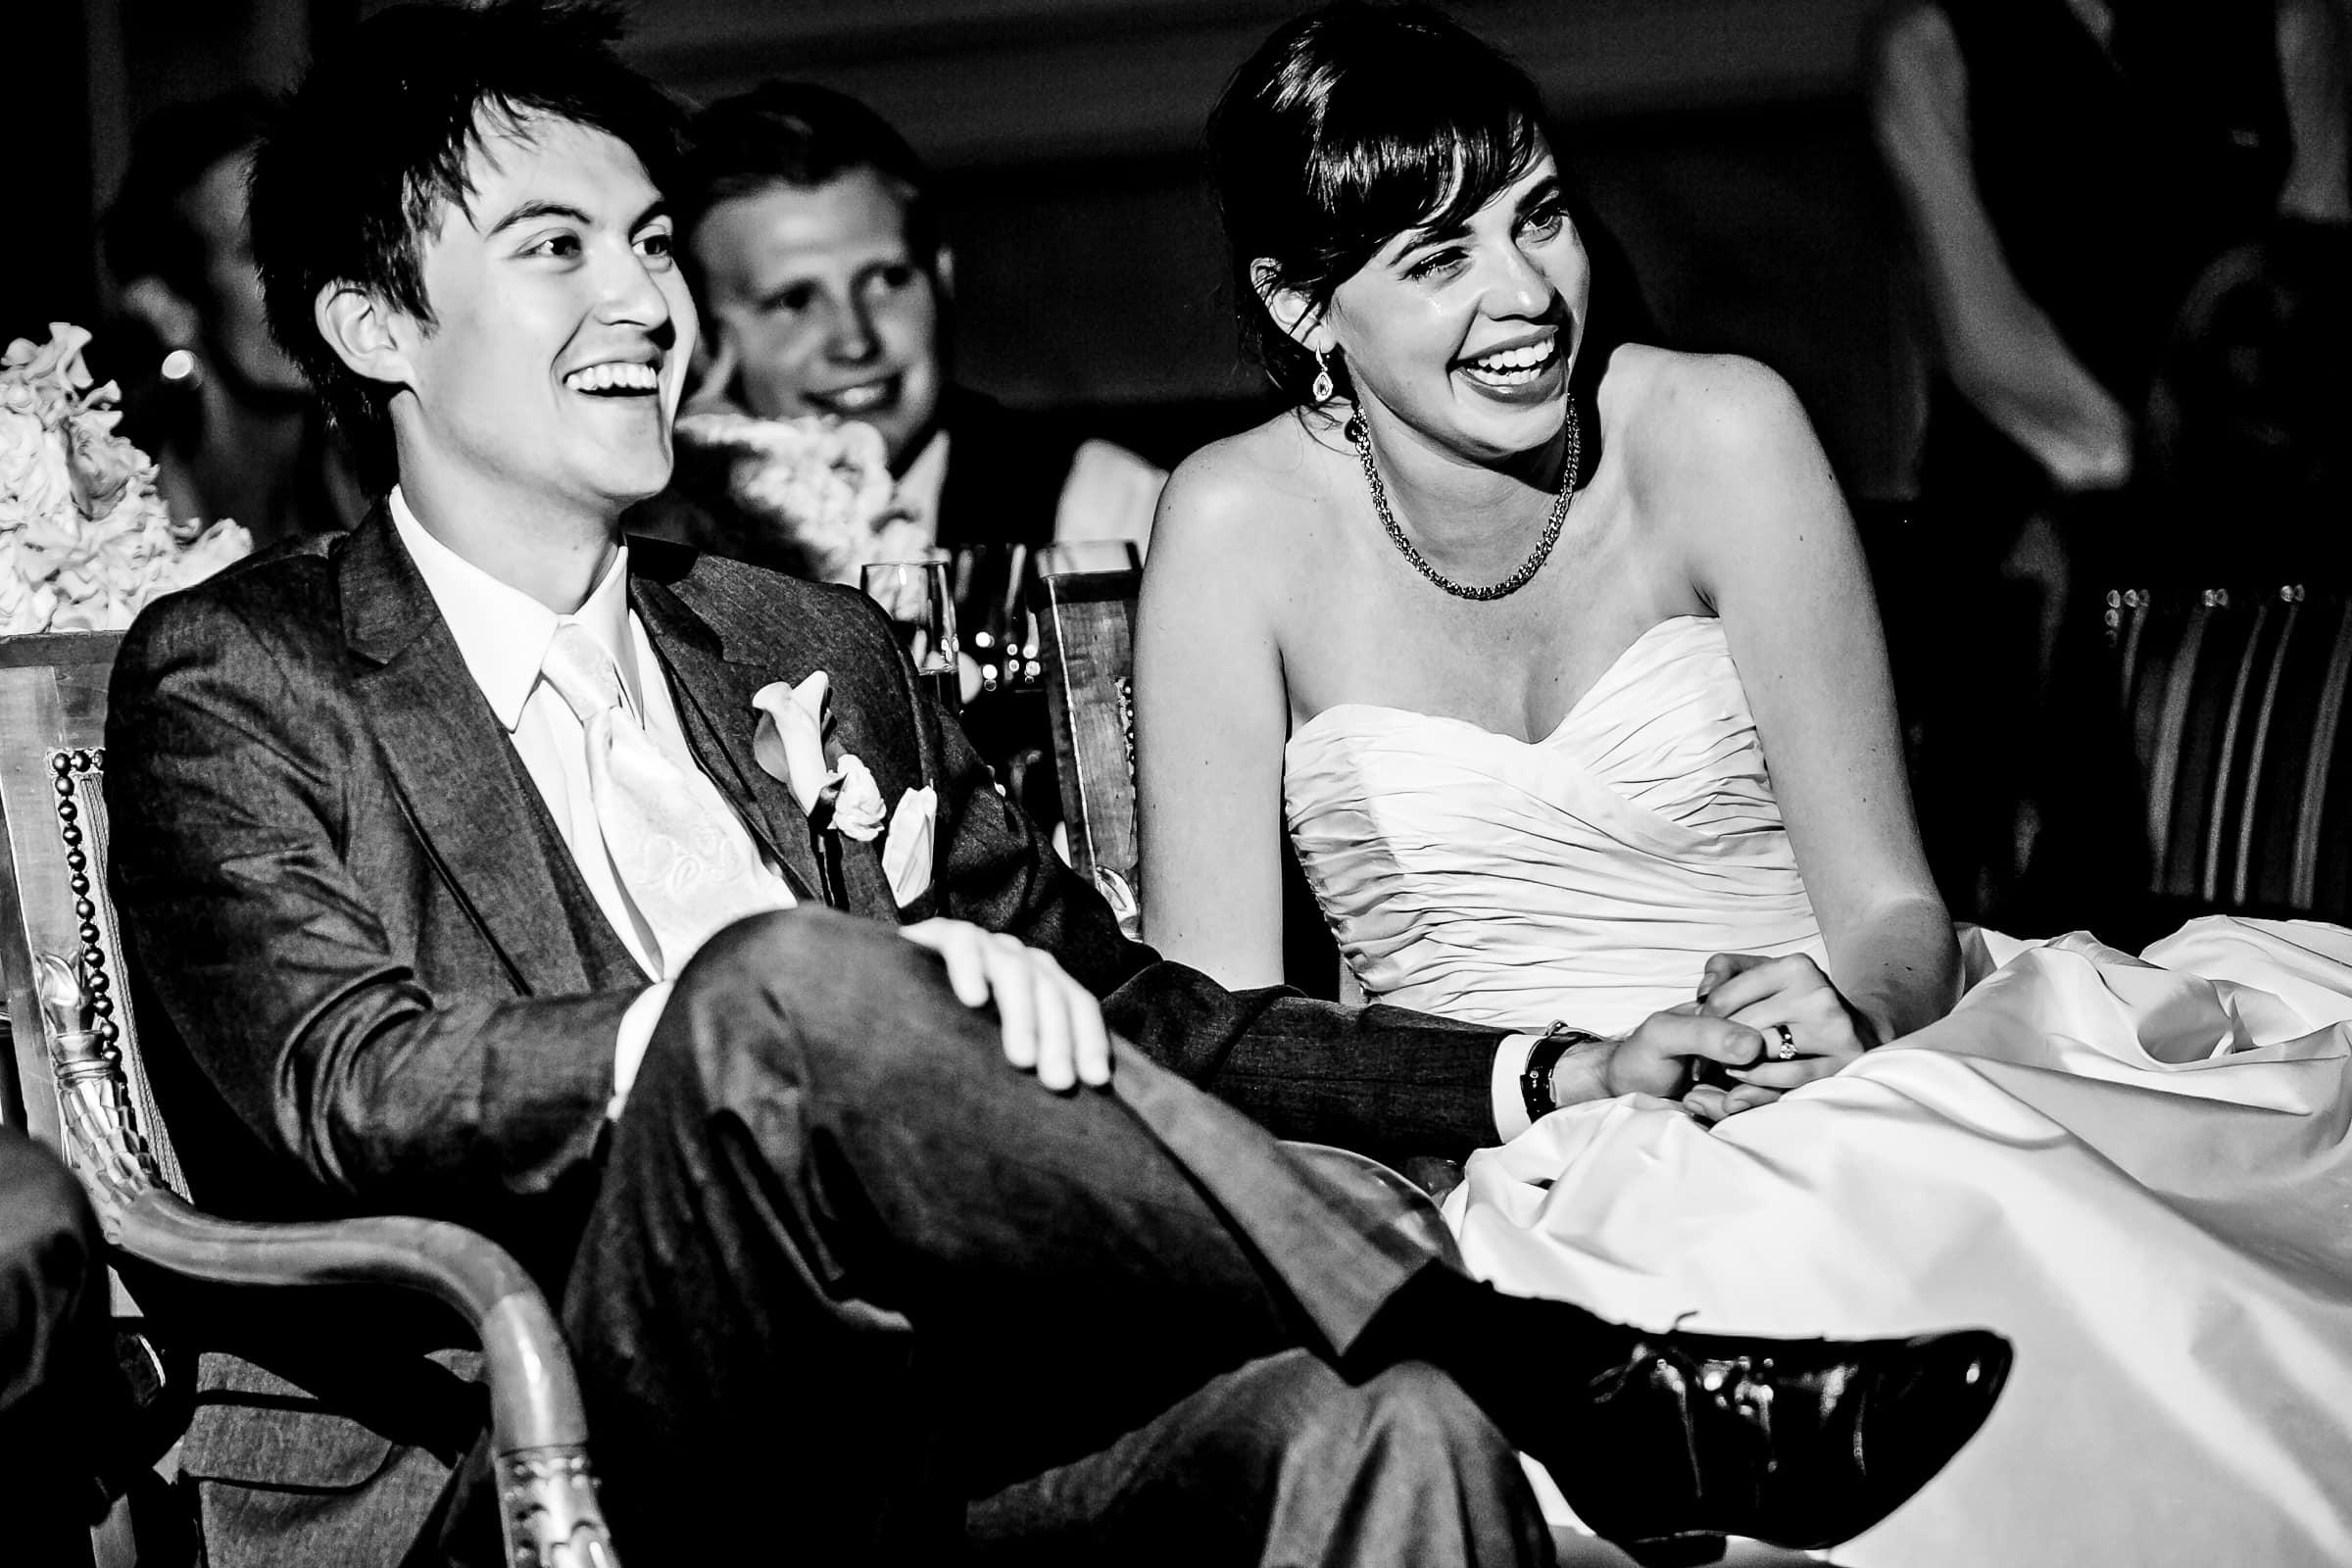 Emotional bride and groom during their Waverley Country Club wedding reception